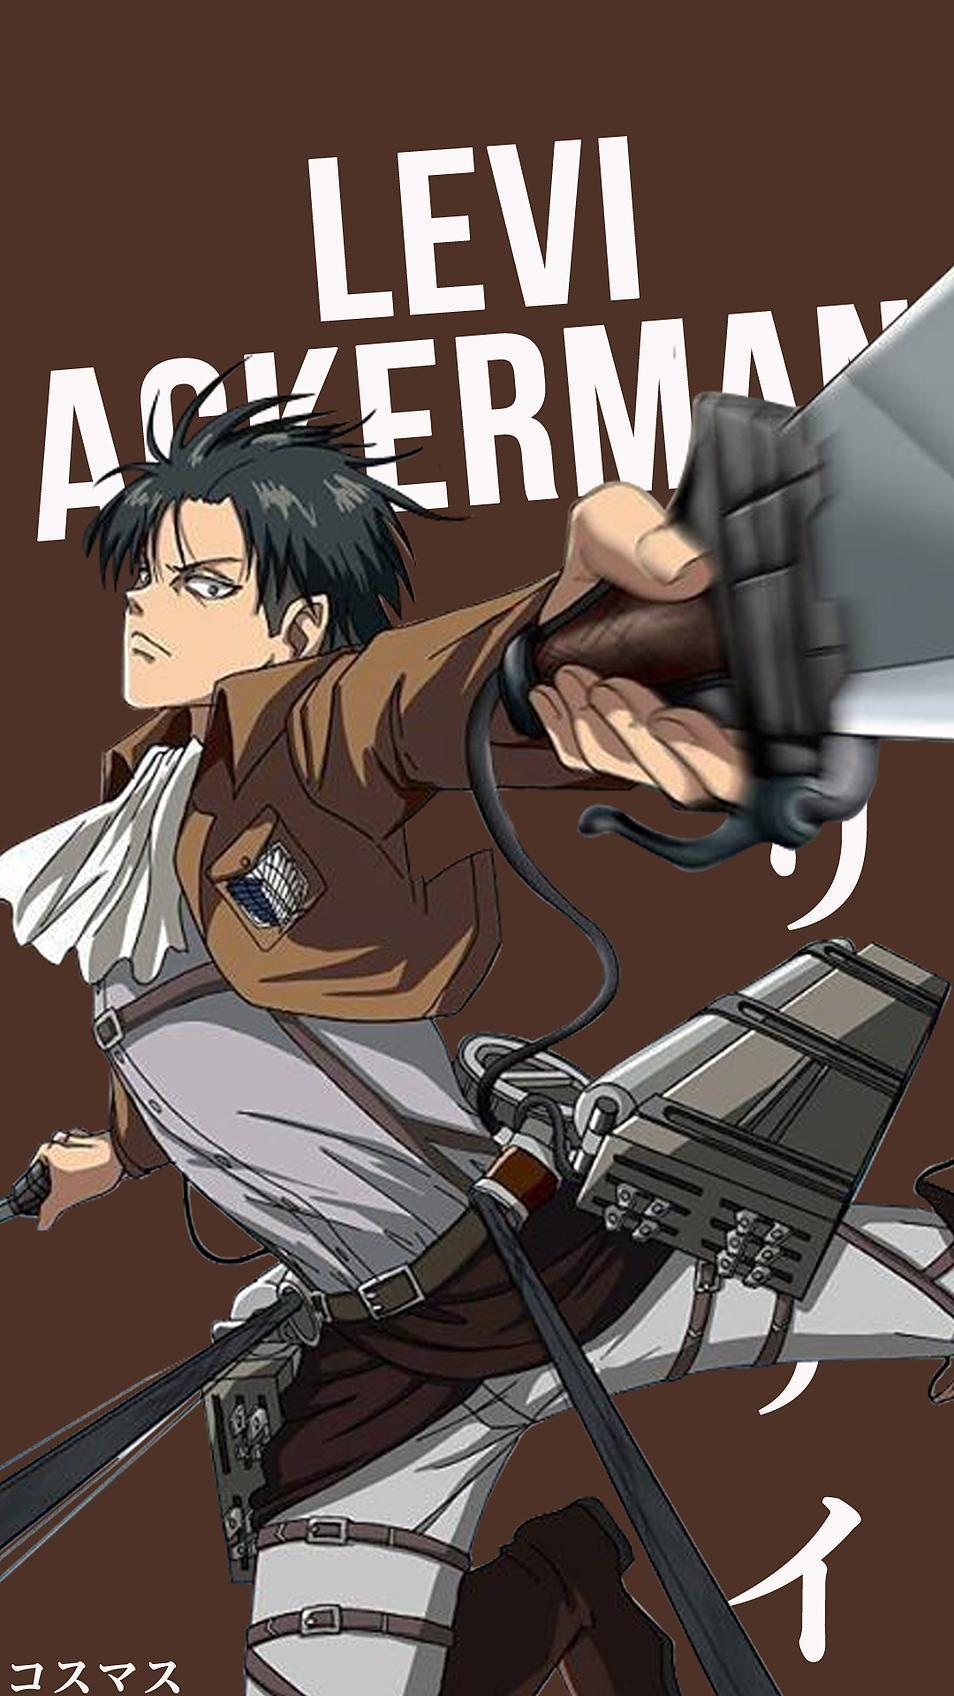 Levi Ackerman V1 in 2020 Attack on titan levi, Anime